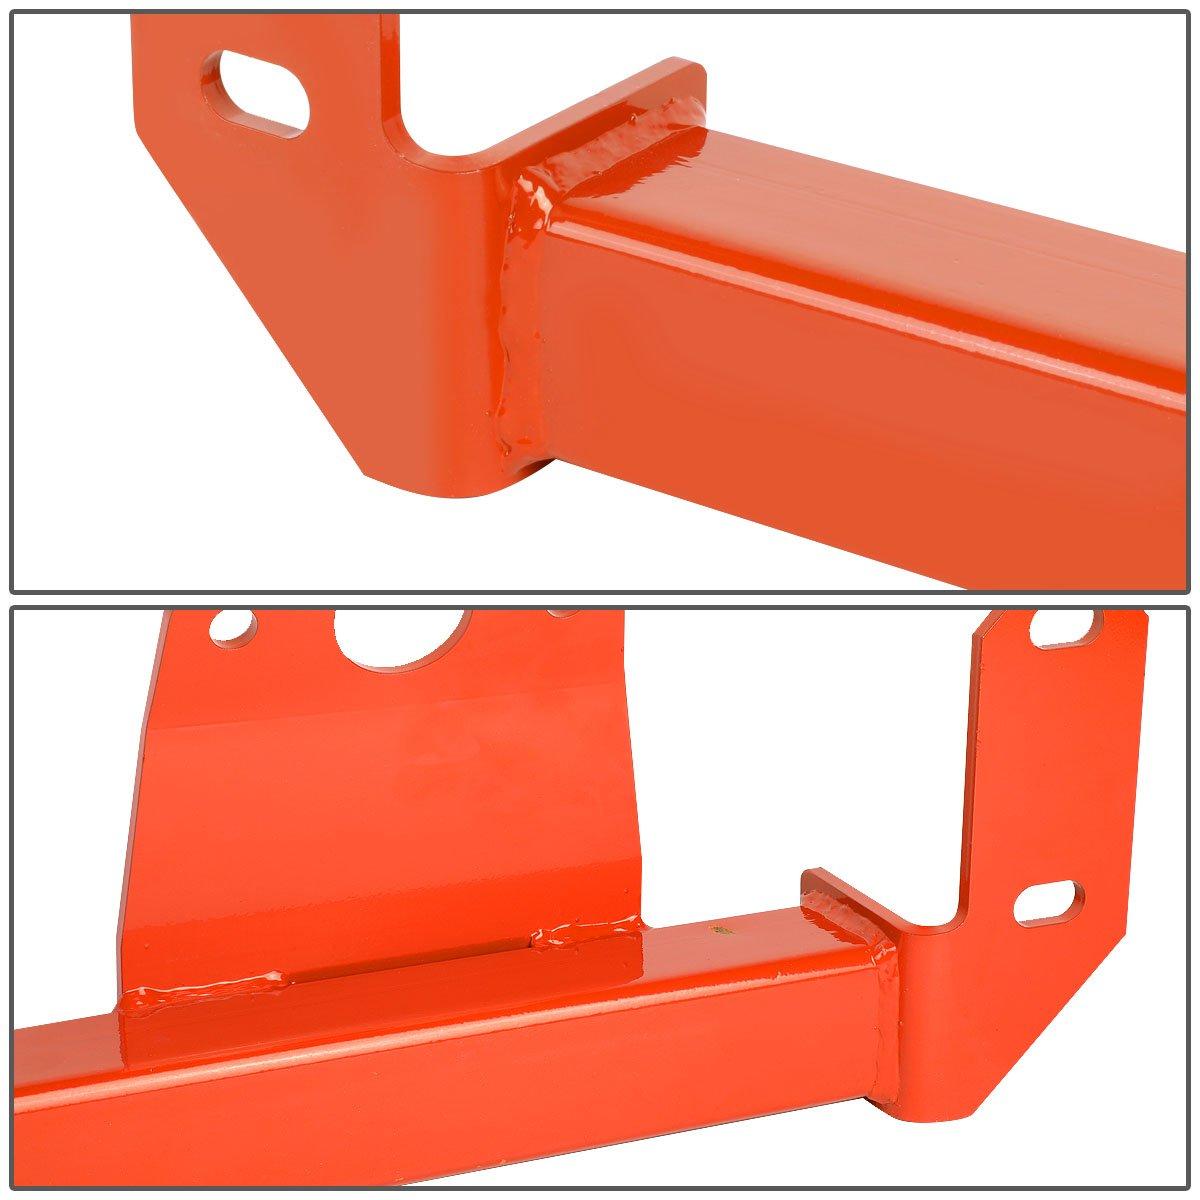 Type 3 AWD Mild Steel Steering Gear Box Stabilizer Brace//Bar Black For Dodge Ram 2500 3500 4WD